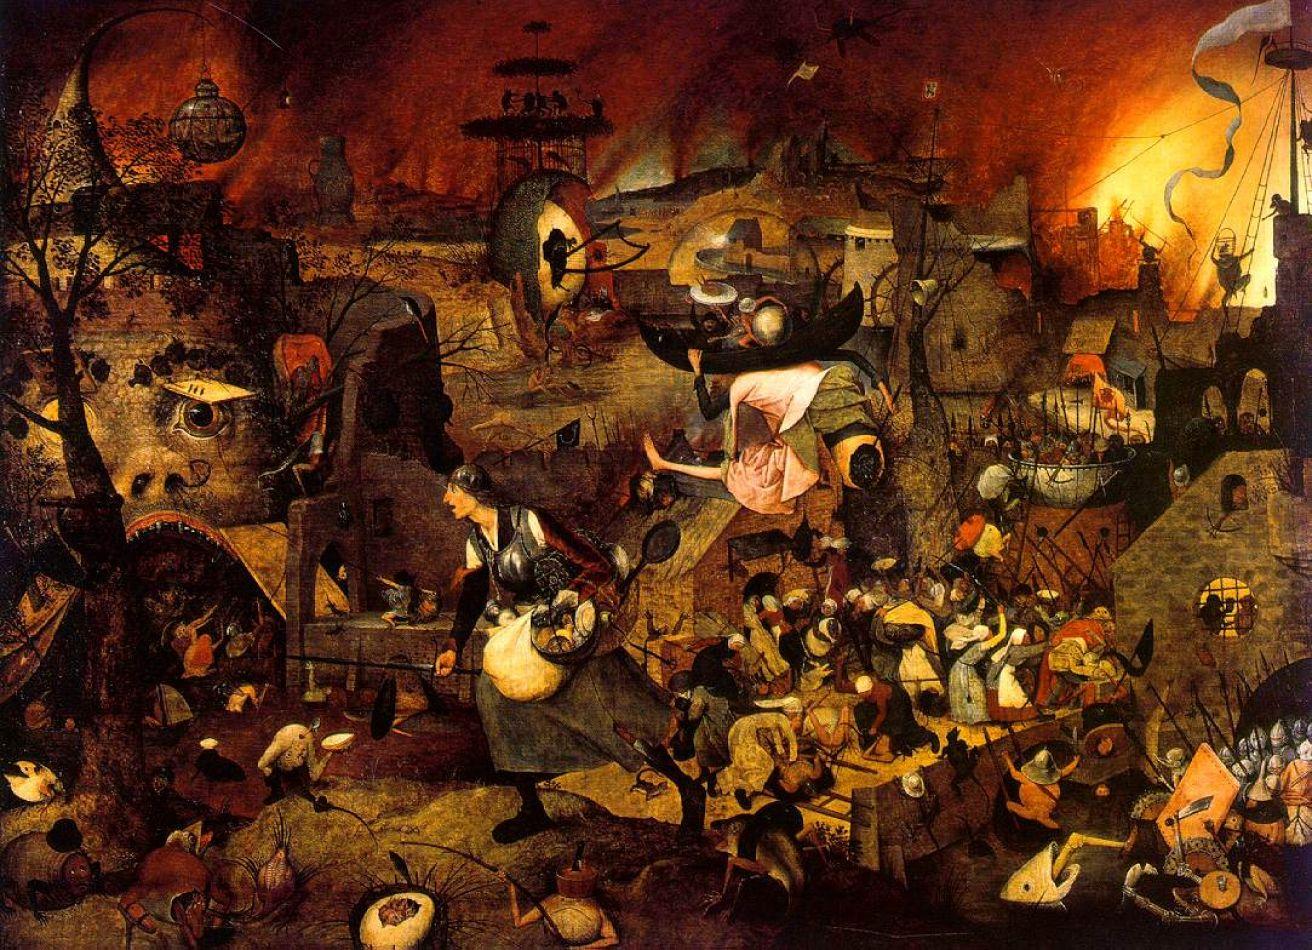 """La loca meg"", cuadro de Pieter Brueghel"